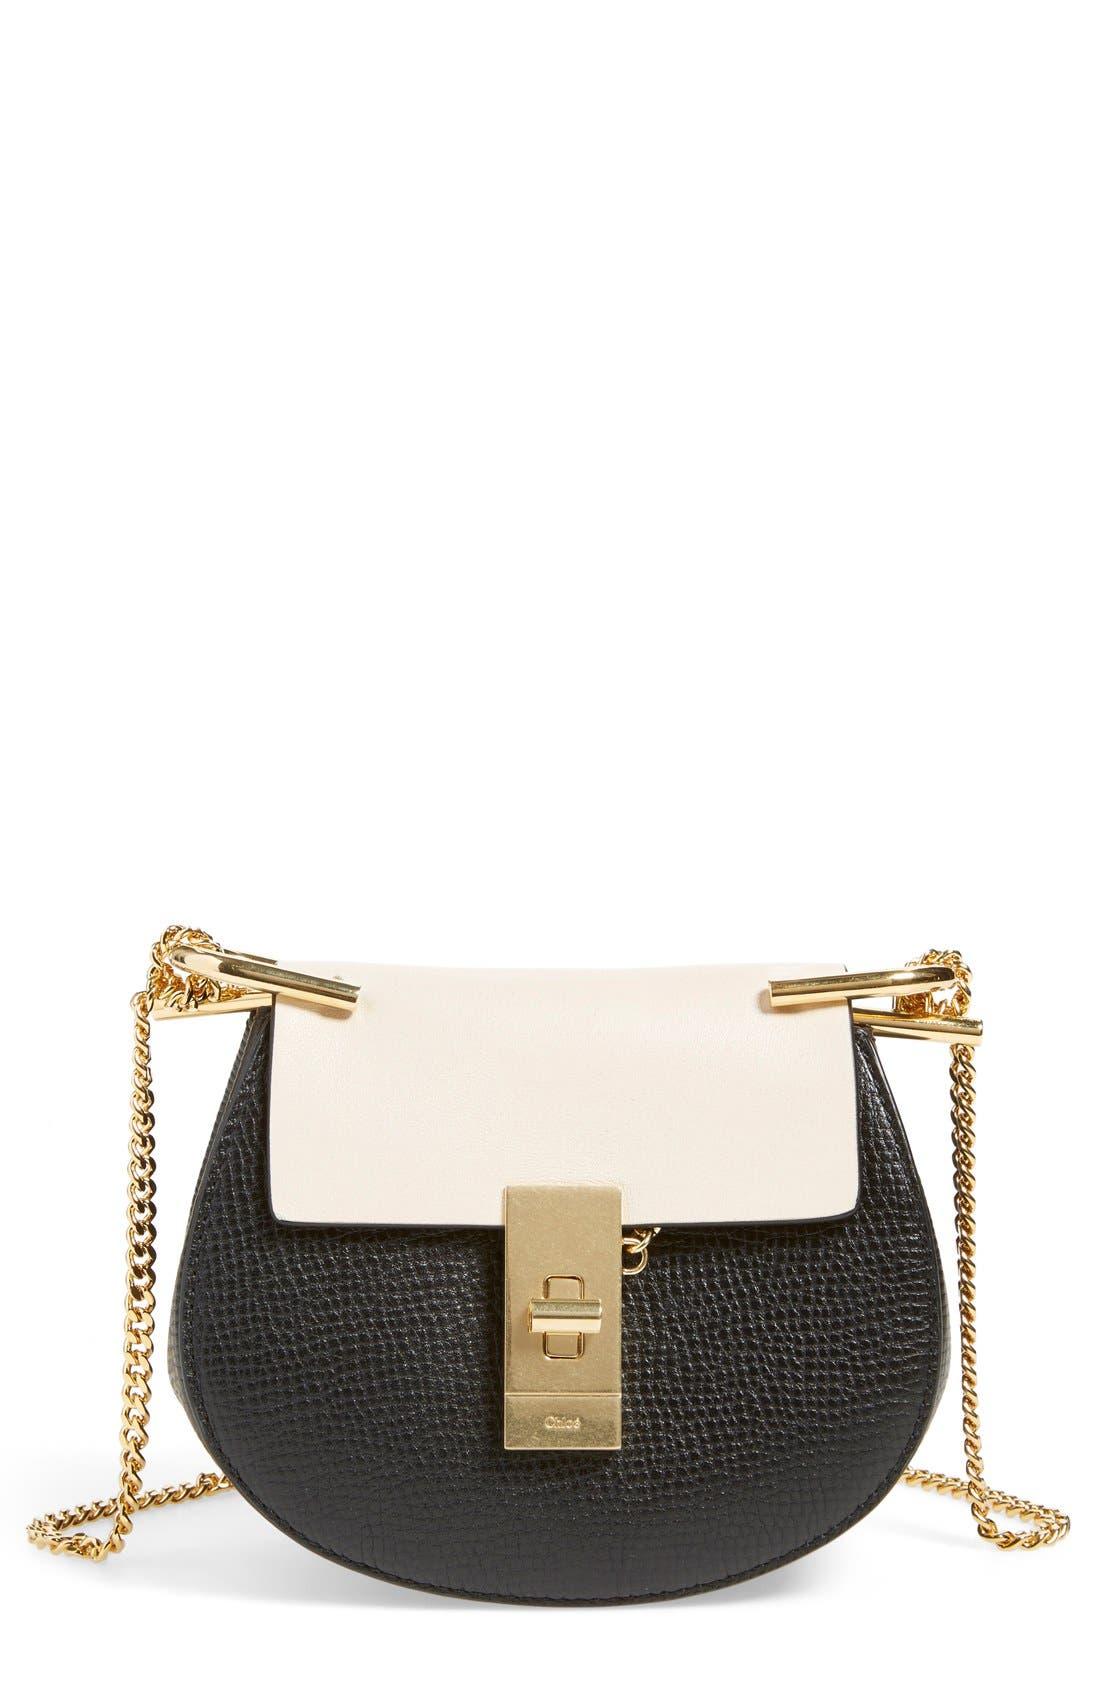 Alternate Image 1 Selected - Chloé 'Nano Drew' Lambskin & Calfskin Leather Shoulder Bag